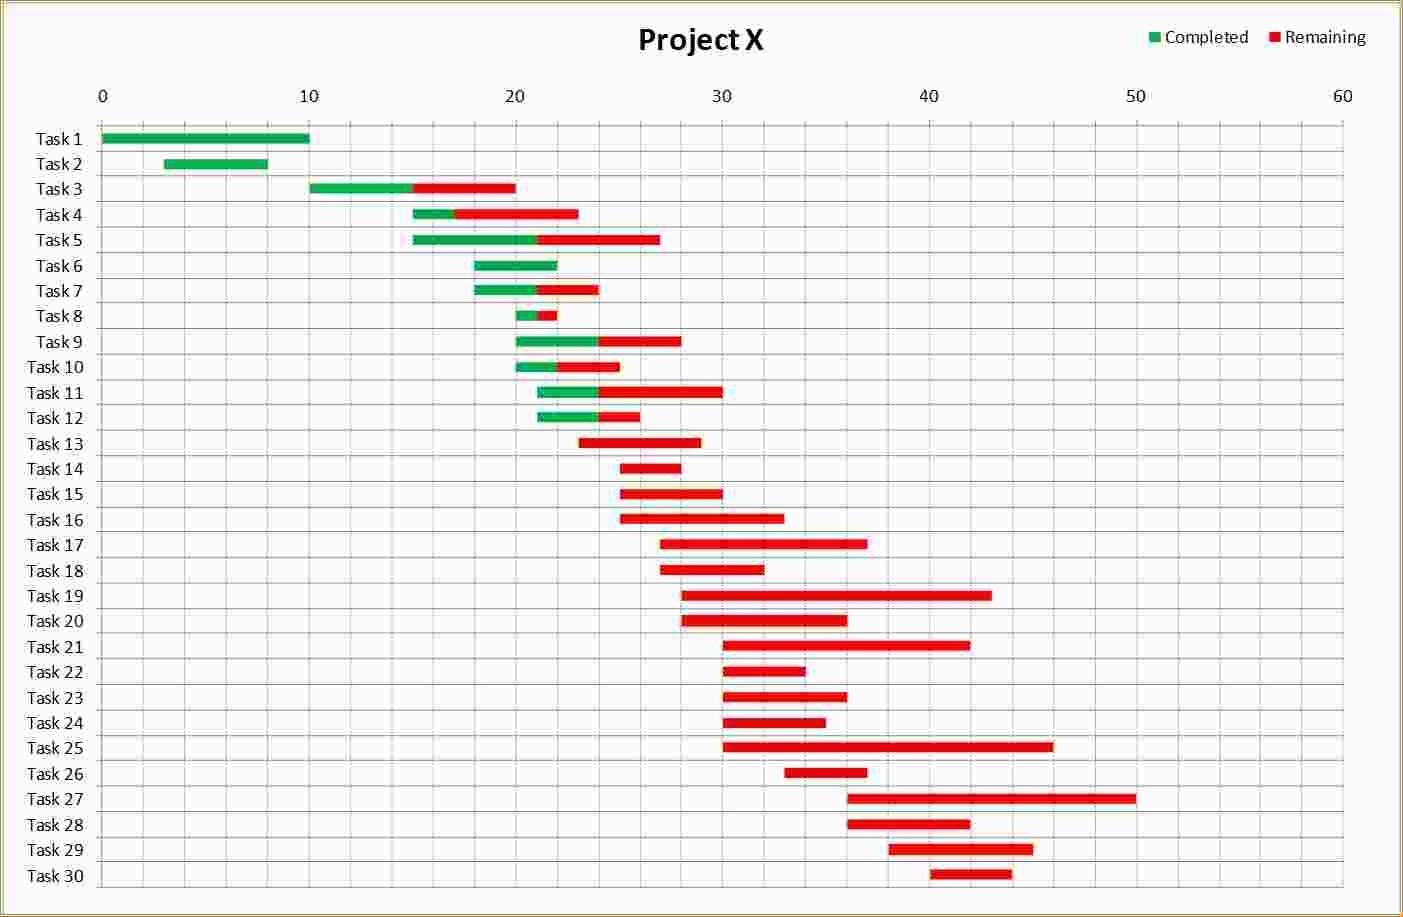 5 Gantt Chart In Excel   Ganttchart Template To Simple Gantt Chart Throughout Excel Gantt Chart Template Dependencies